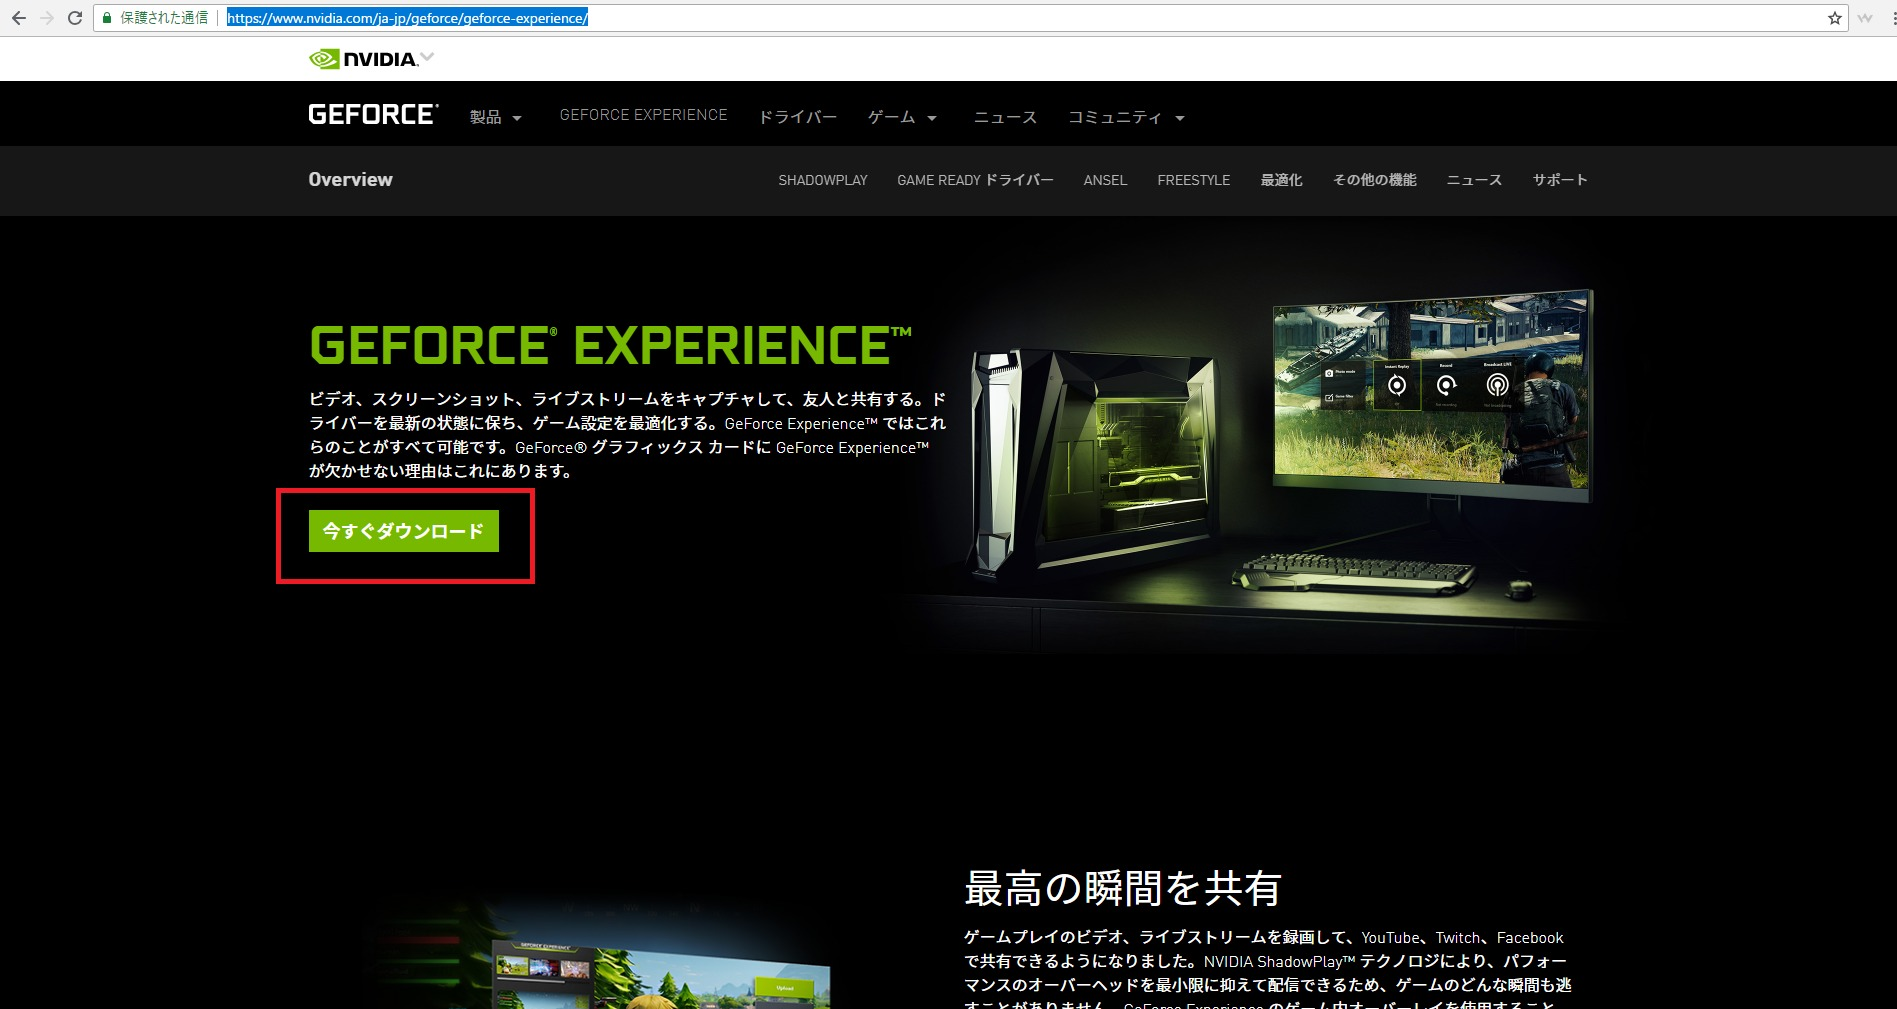 eForce Experienceのダウンロード1